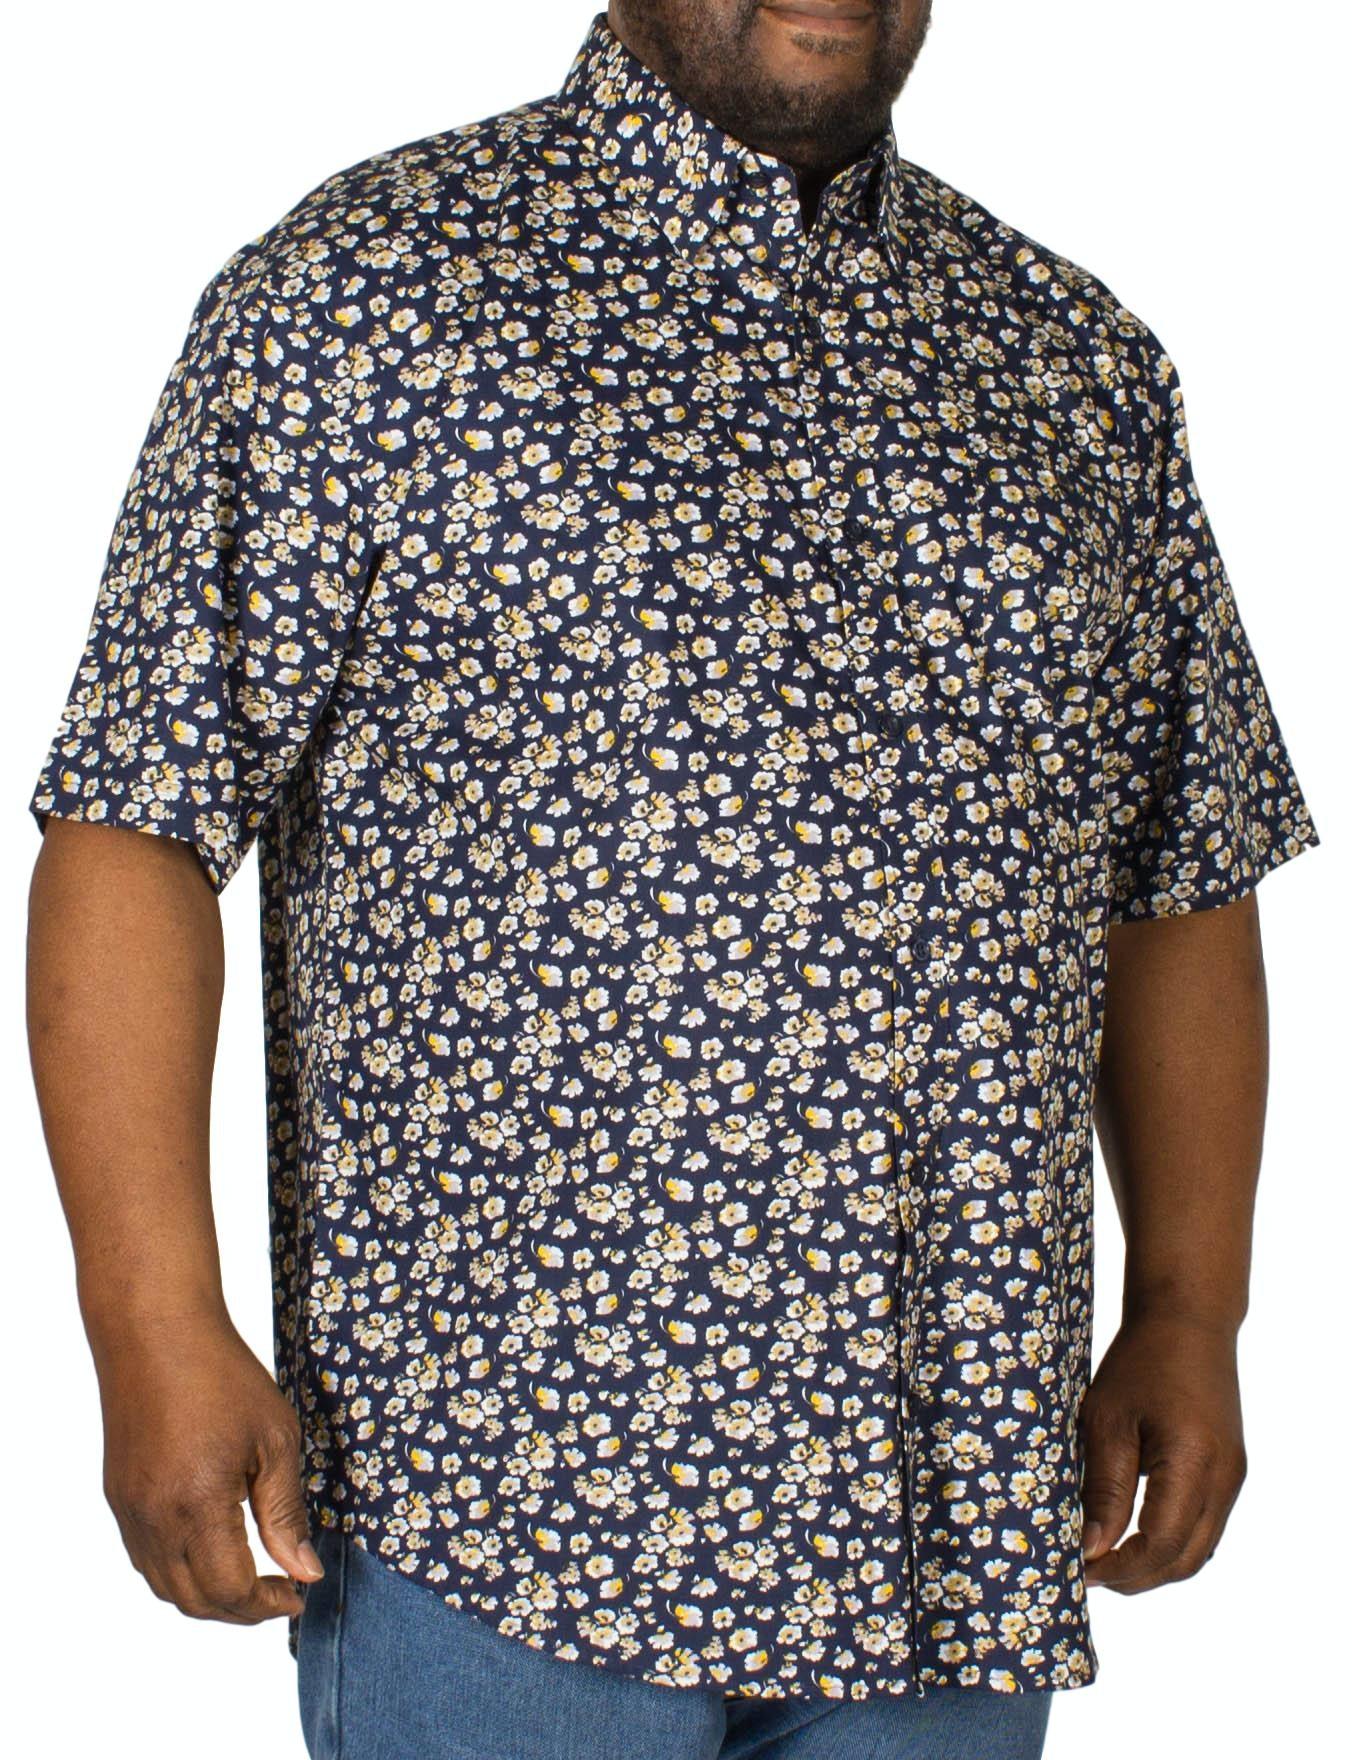 Espionage Floral Print Short Sleeve Shirt Navy